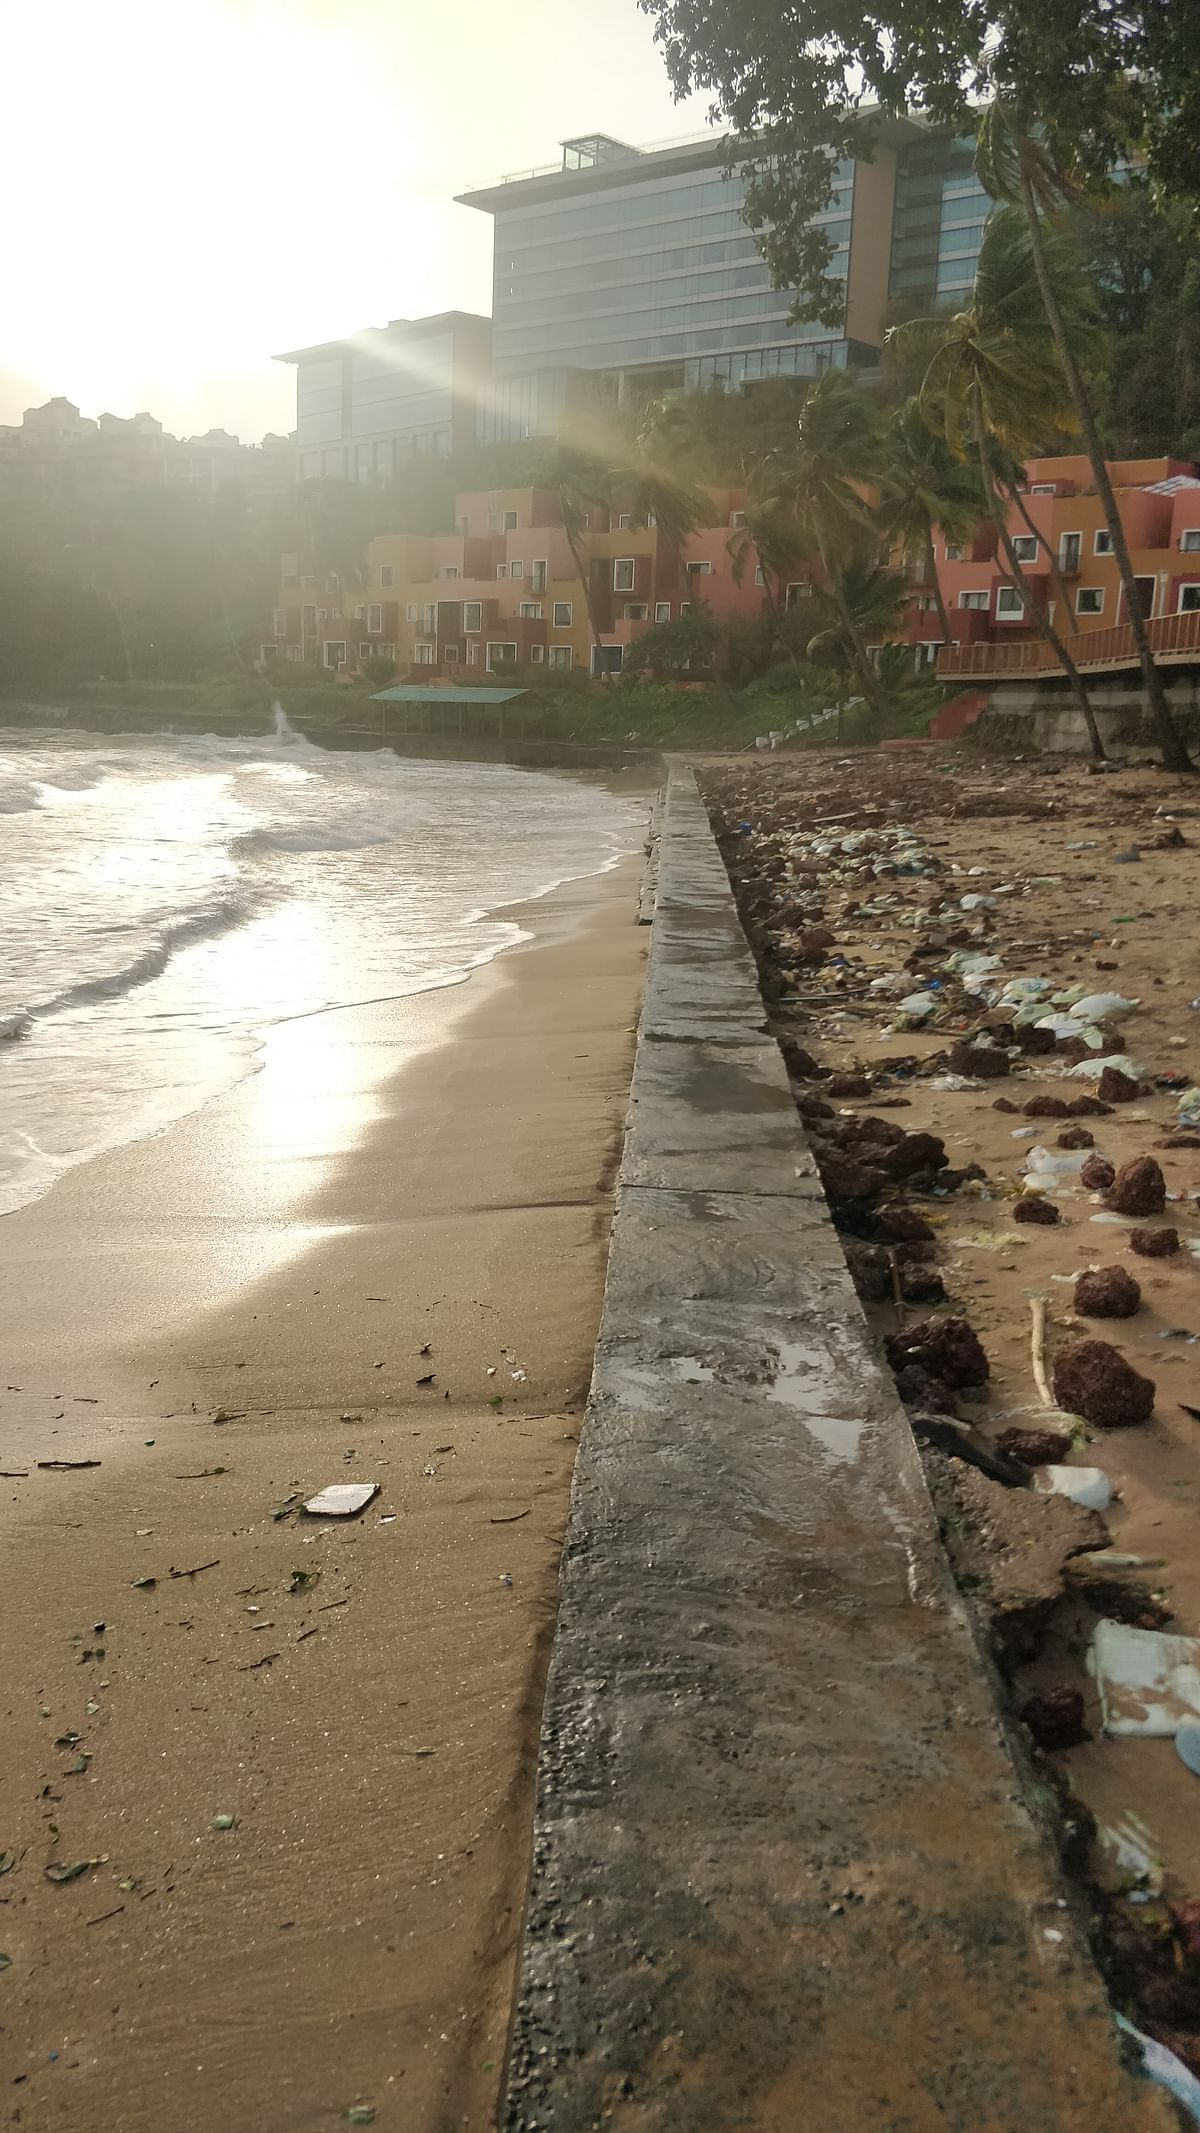 Concrete Wall at Goa's Vainguinim Beach: Why Locals Are Protesting